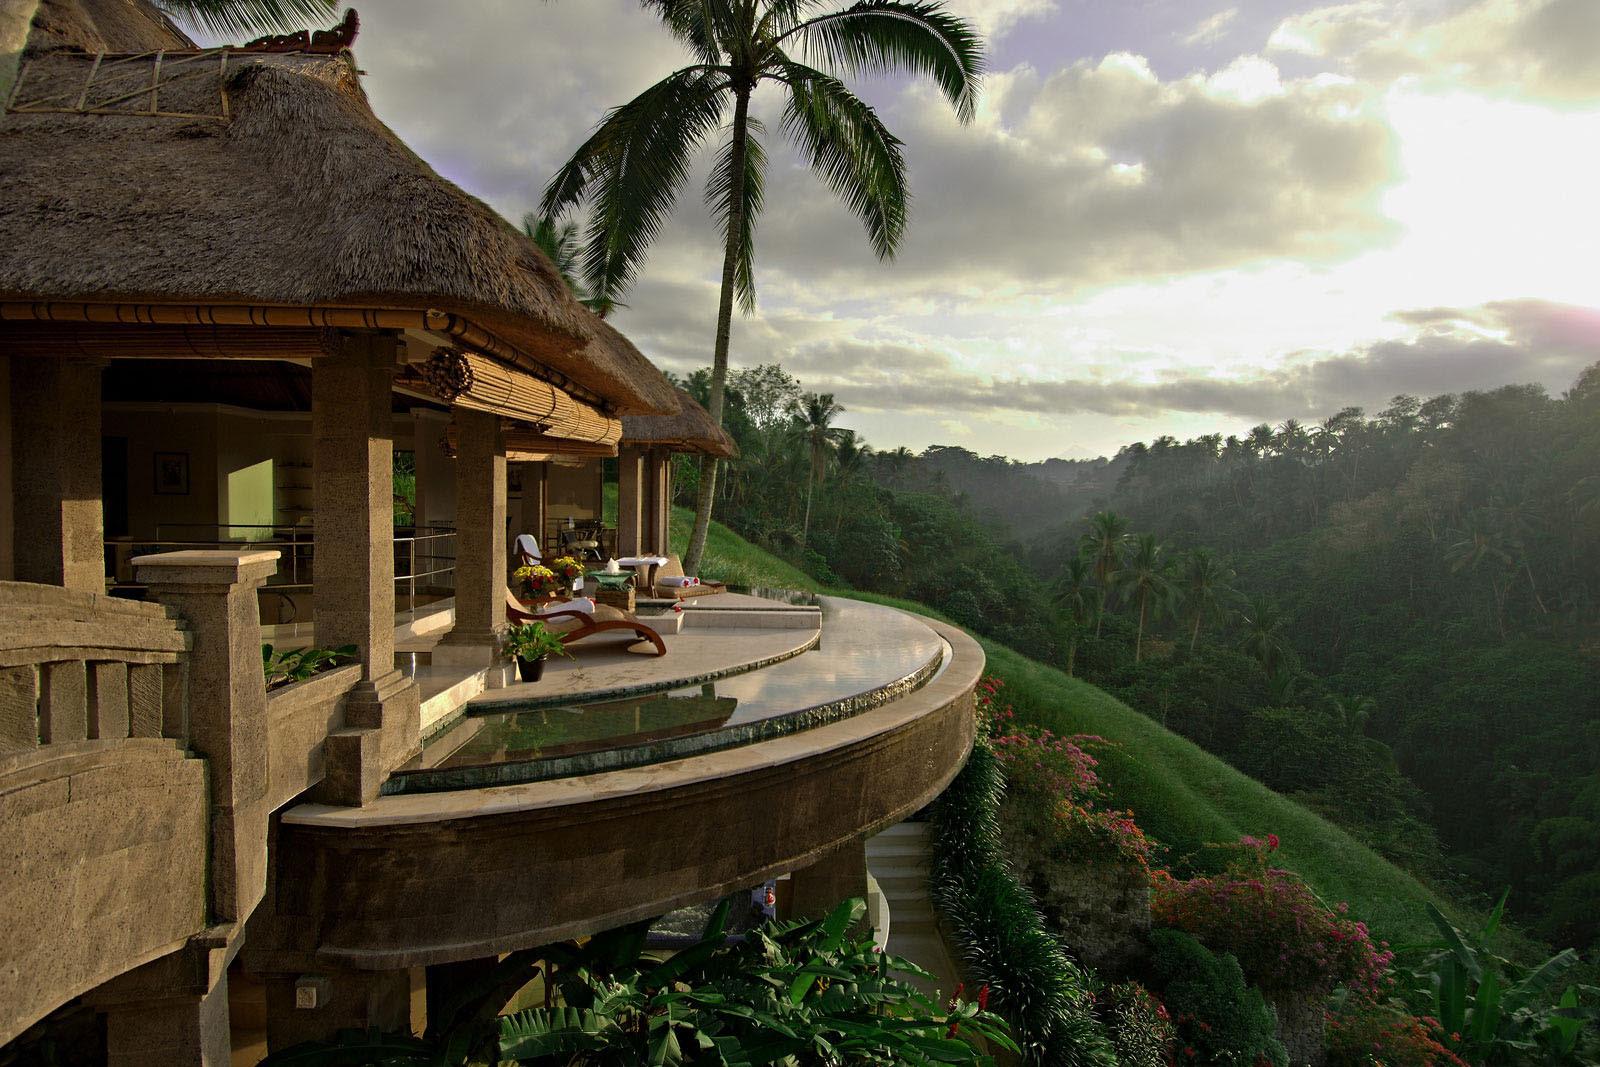 Viceroy-Bali-Resort_1.jpg